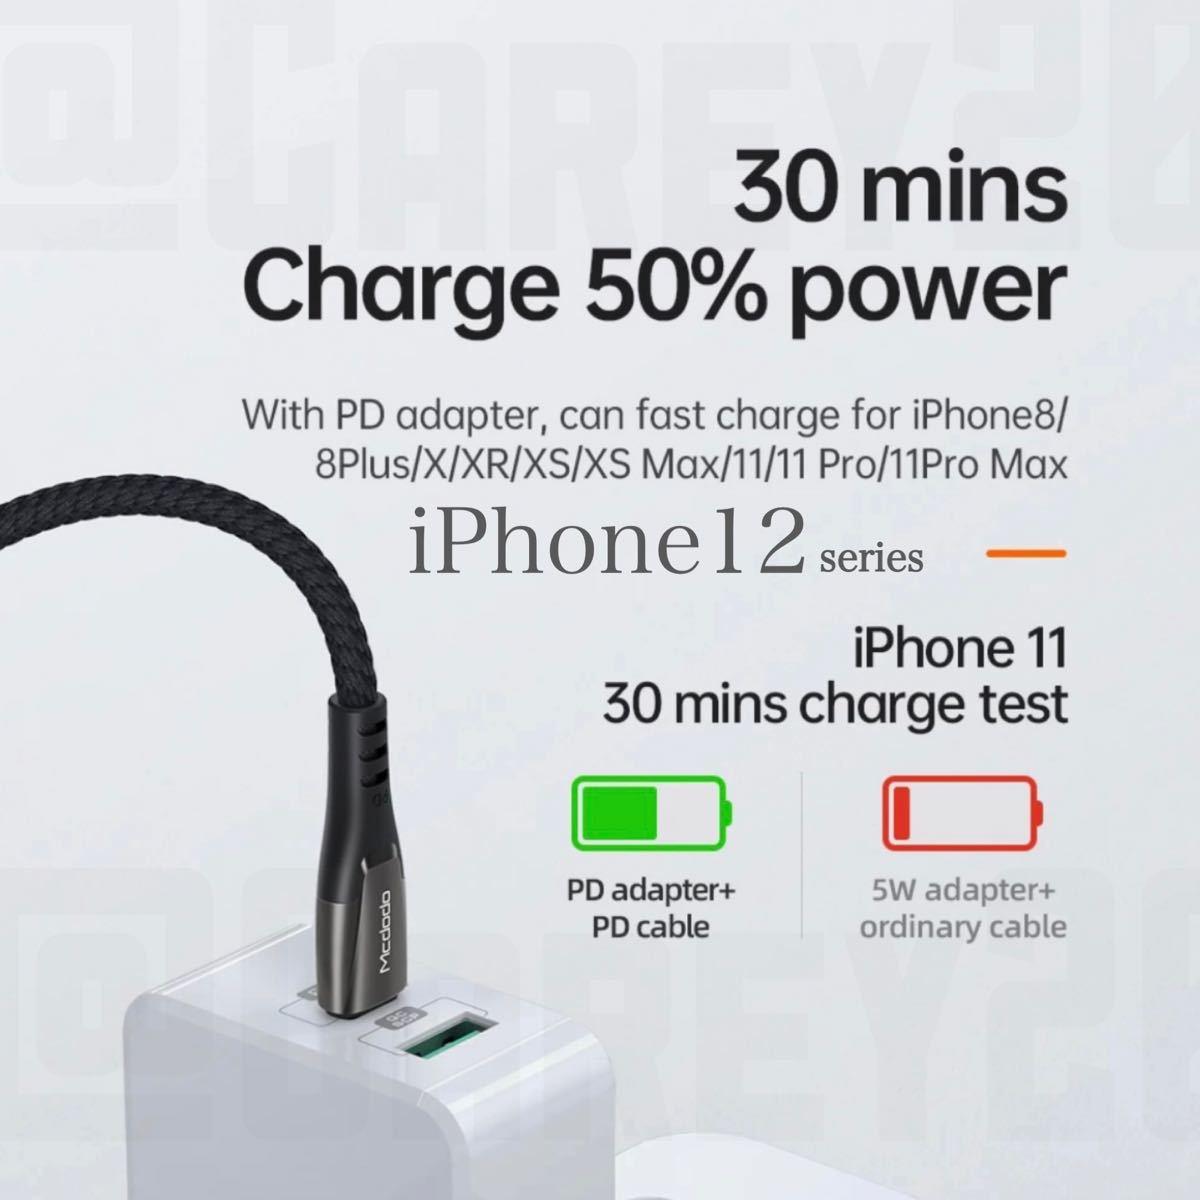 iPhone12 iPad 36w インジケーター付USB-C ライトニング ケーブル 高級 高品質 高耐久 ハイスペック 充電